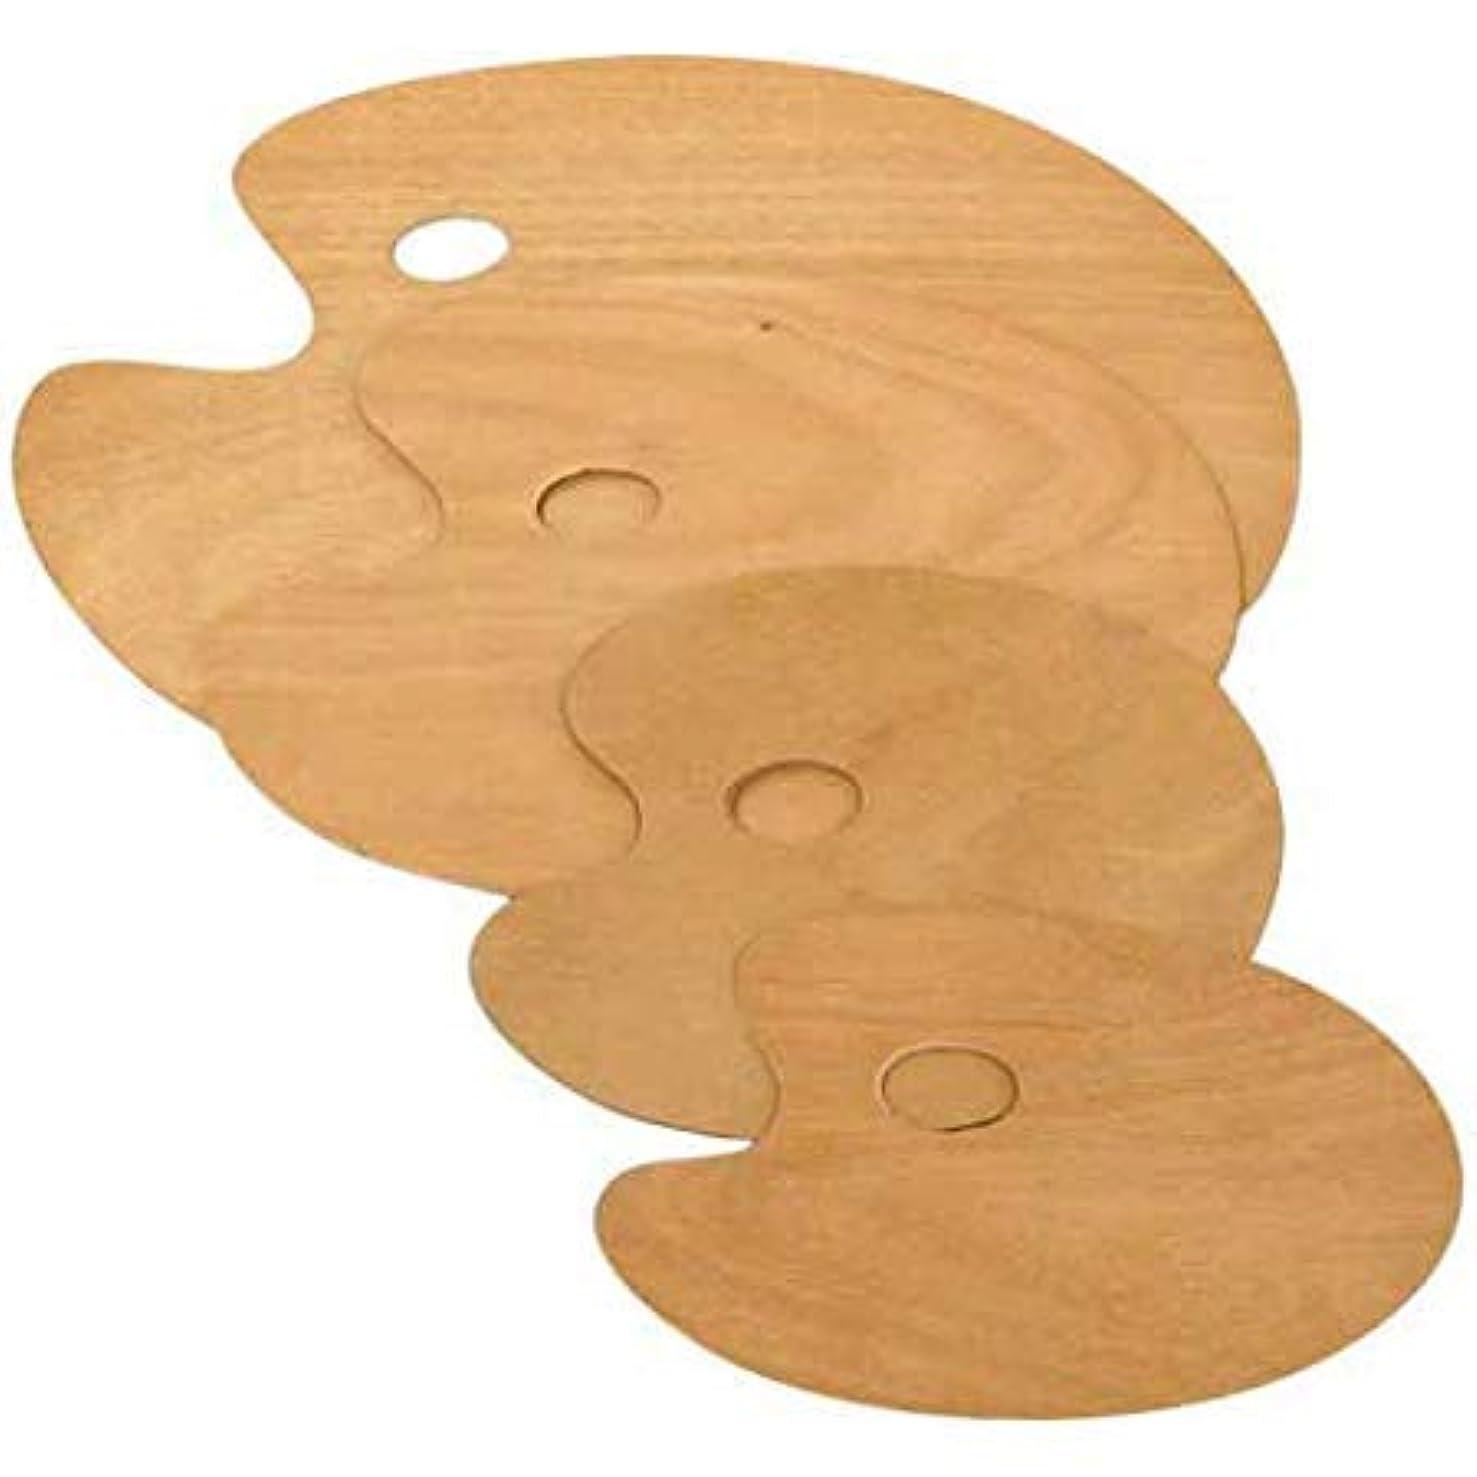 Wood Palette Oval 9.88x11.75